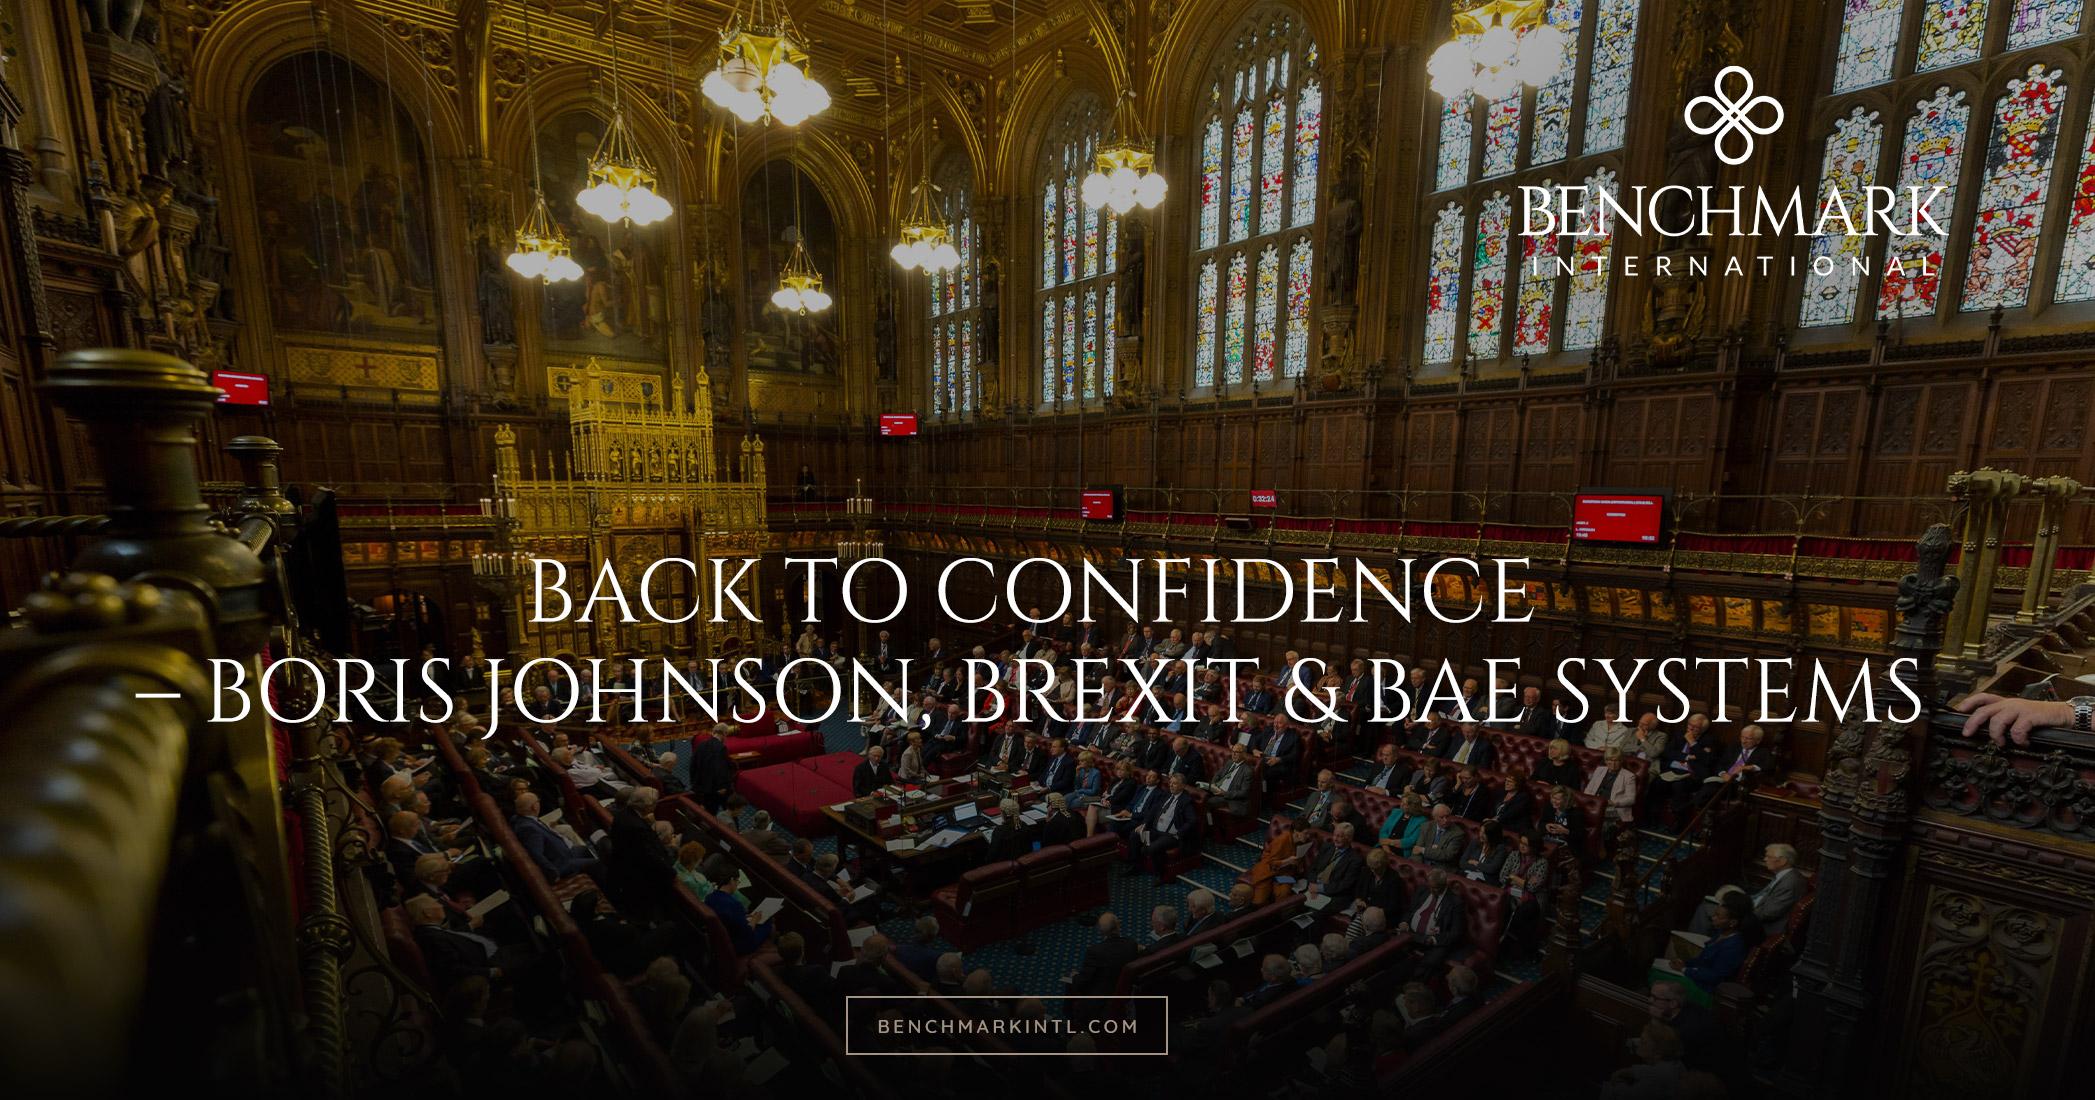 Back to Confidence – Boris Johnson, Brexit & BAE Systems